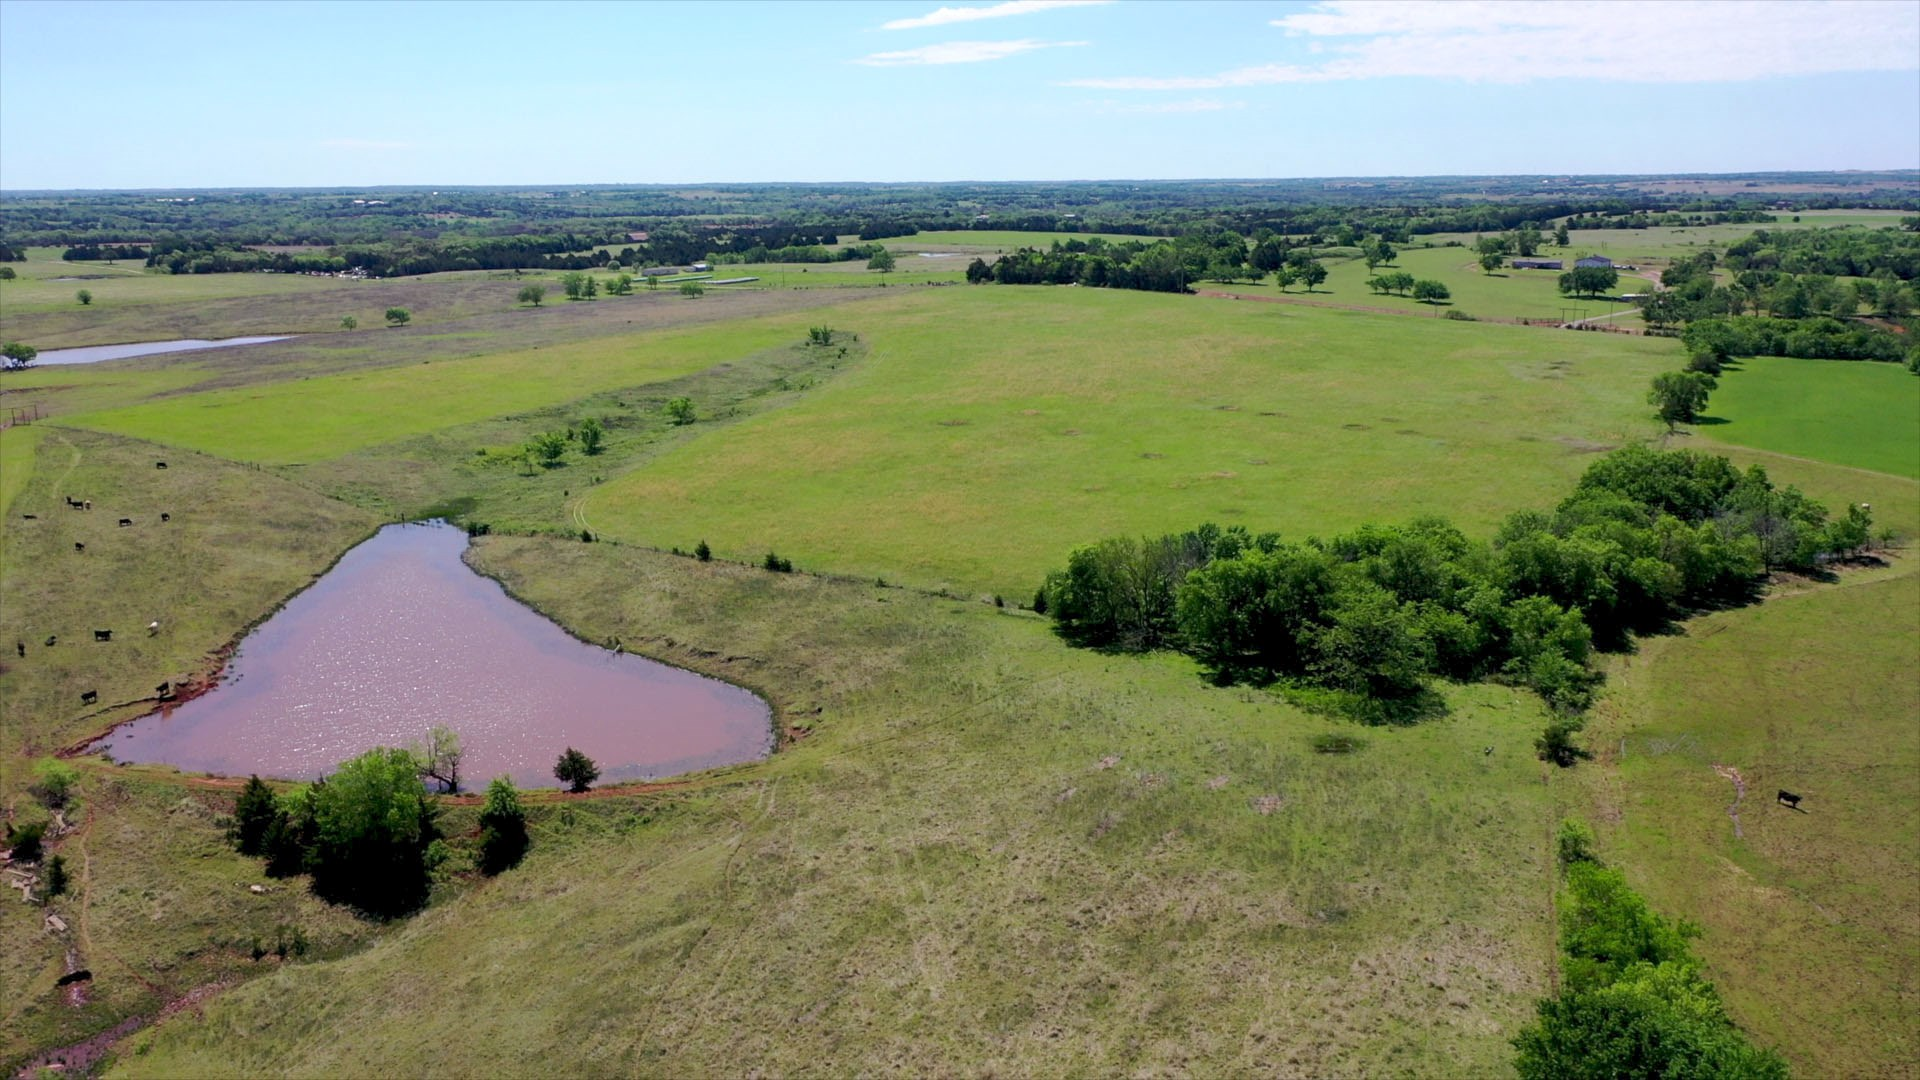 No Reserve Land Auction, Perkins OK, Jun 15 @ 6:30 p.m. Tr 1